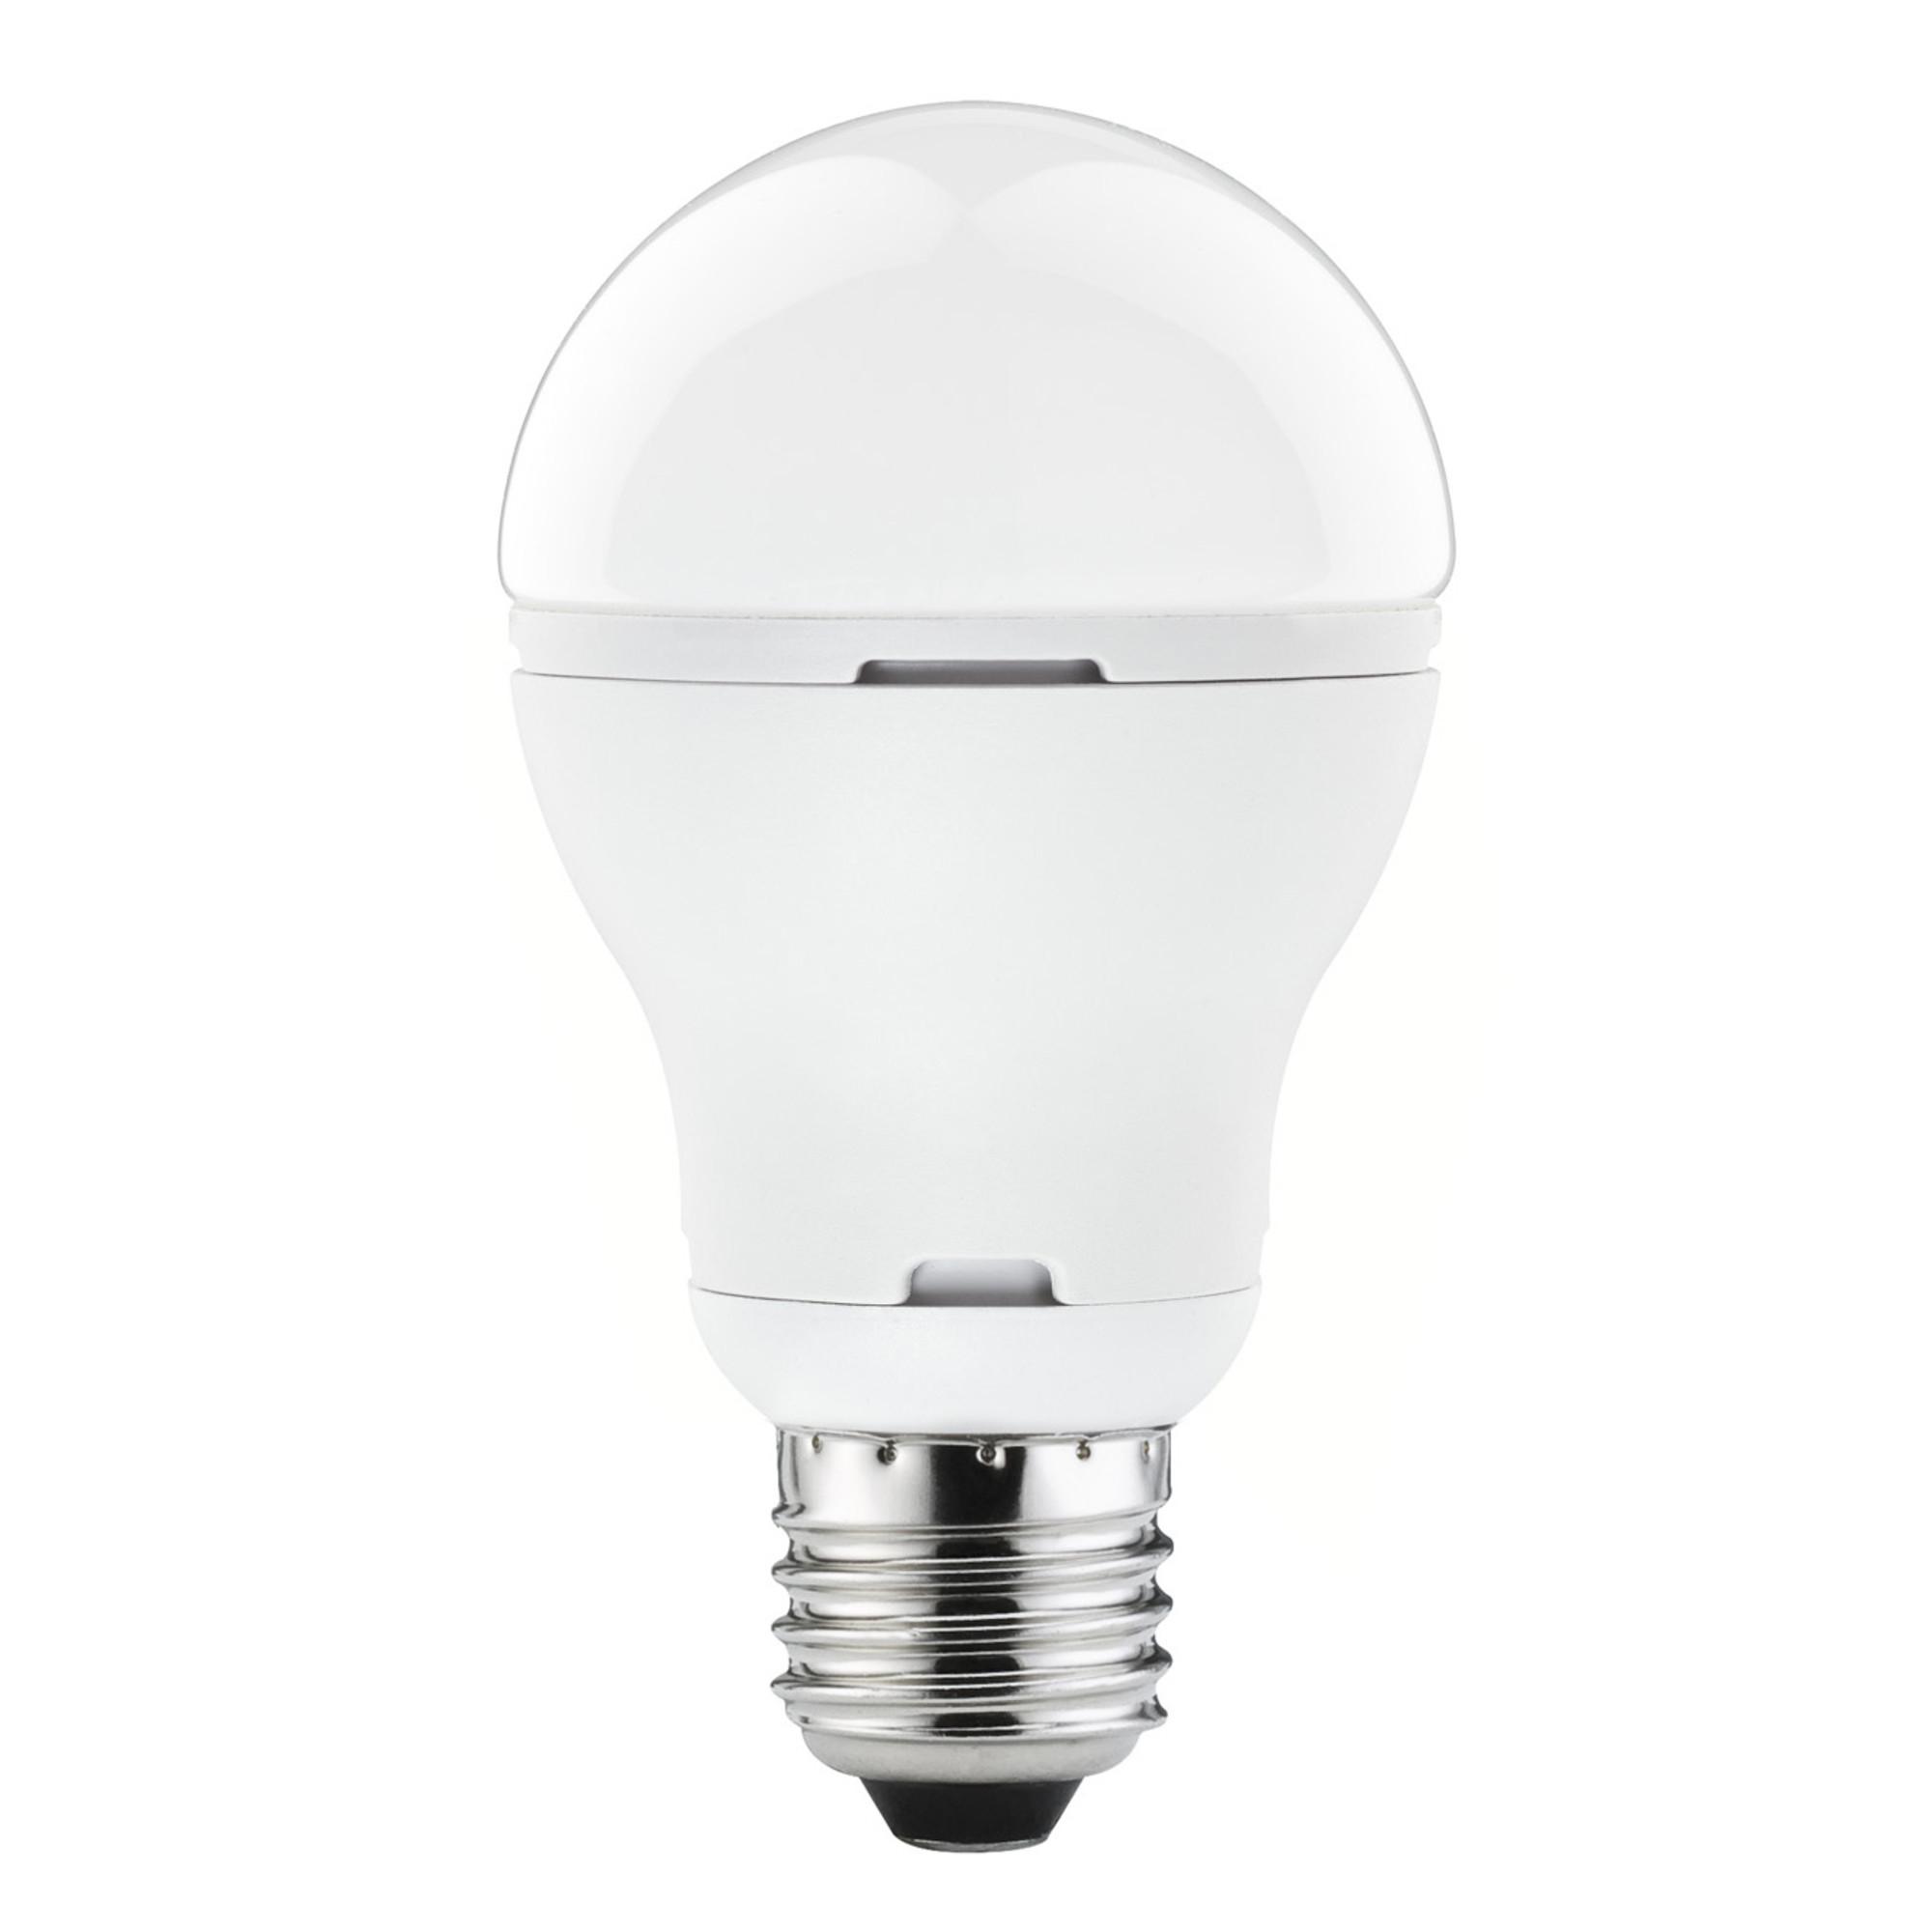 Лампа светодиодная Paulmann 28150 E27 470 Лм теплый свет